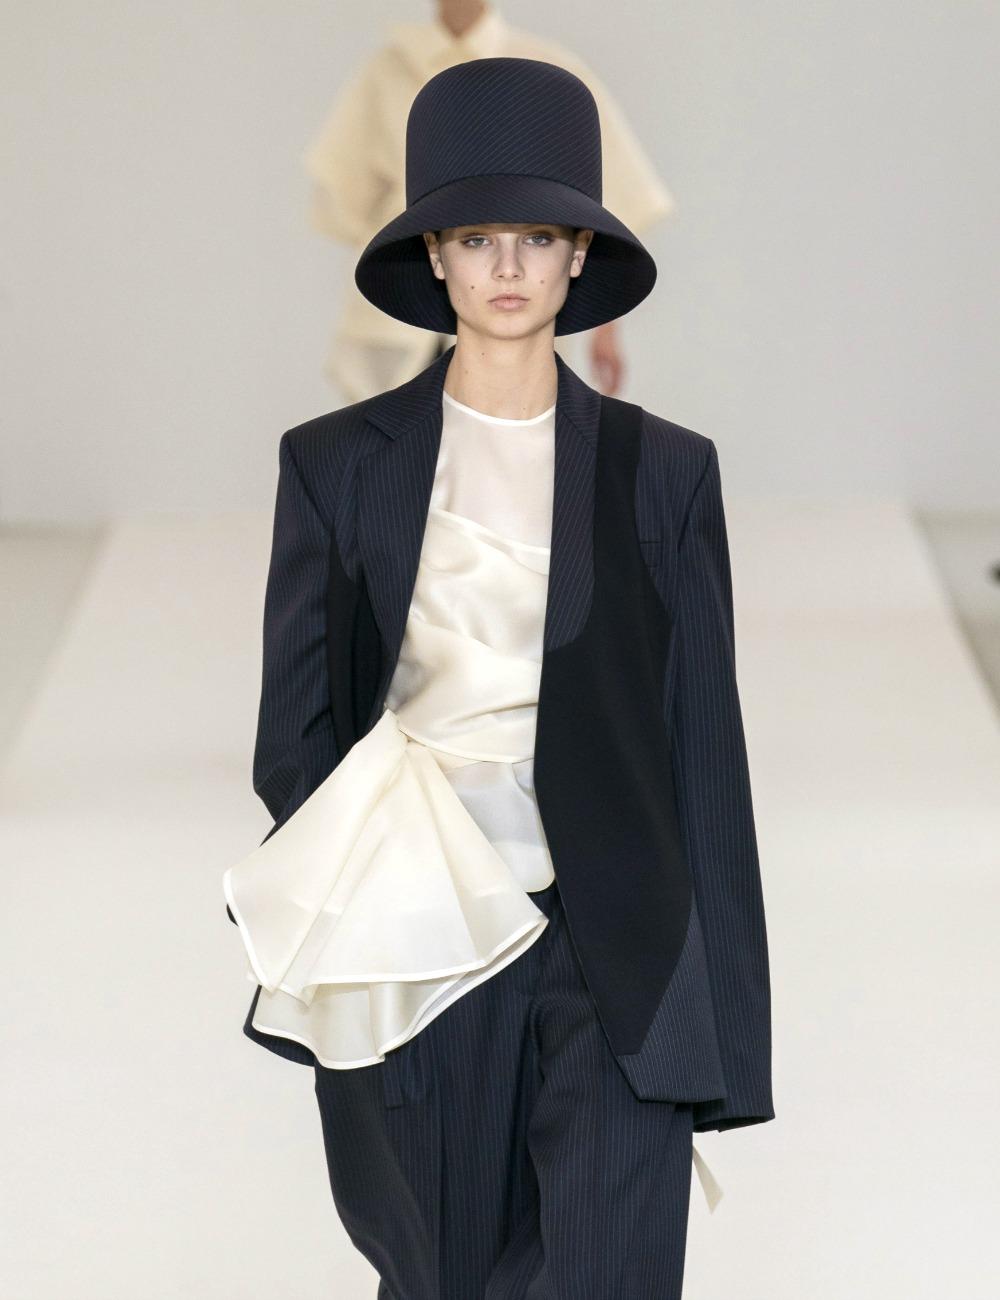 2019 Fall Fashion Trends to Wear Now I Statement Hats on the Nina Ricci AW19 Runway #FallFashion #Runway #Trends #FashionBlog #Styleinspo